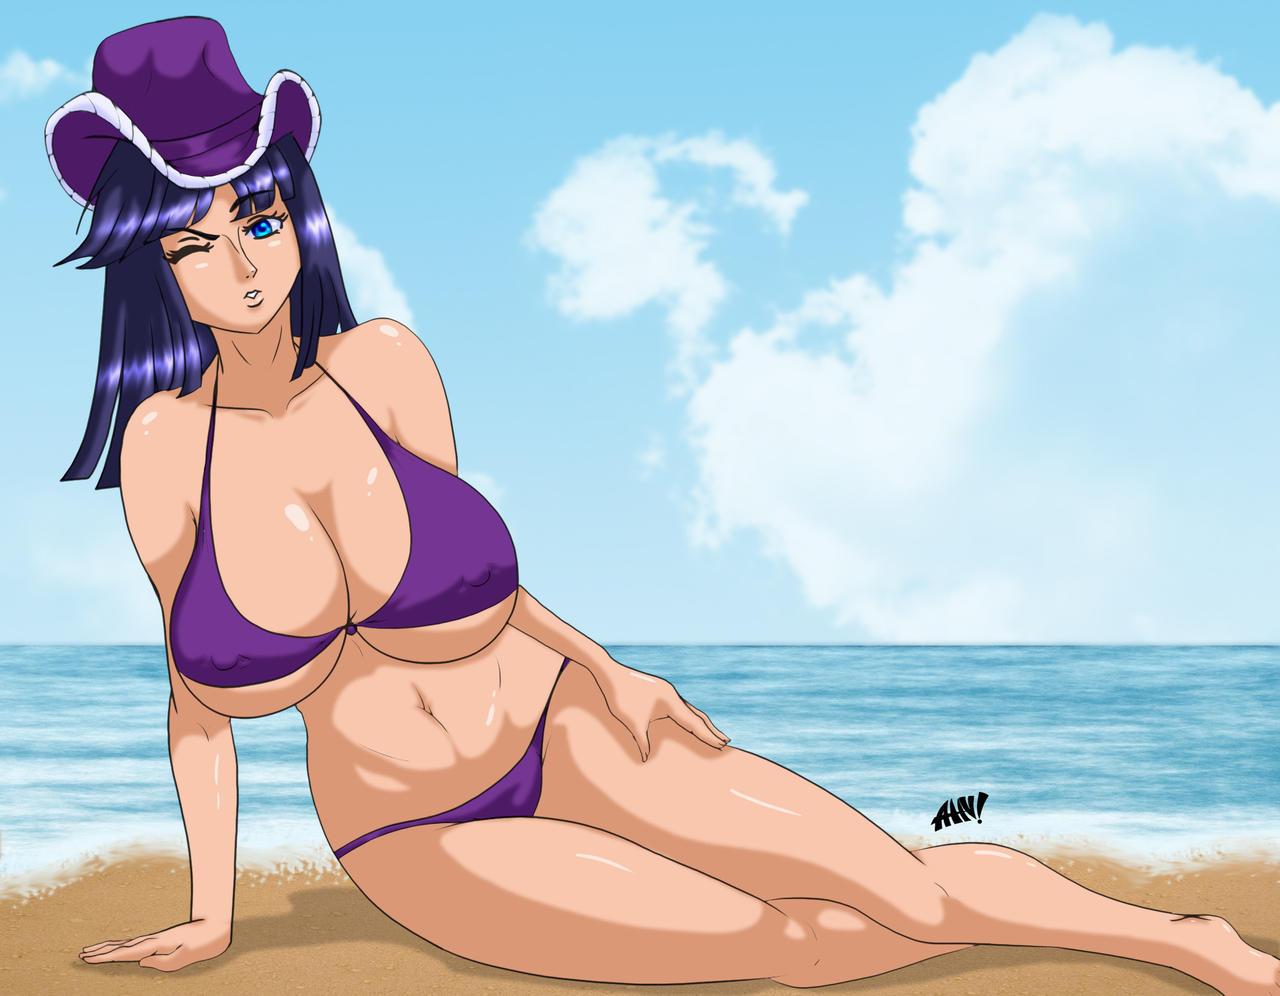 Nico Robin by atomskmaster6